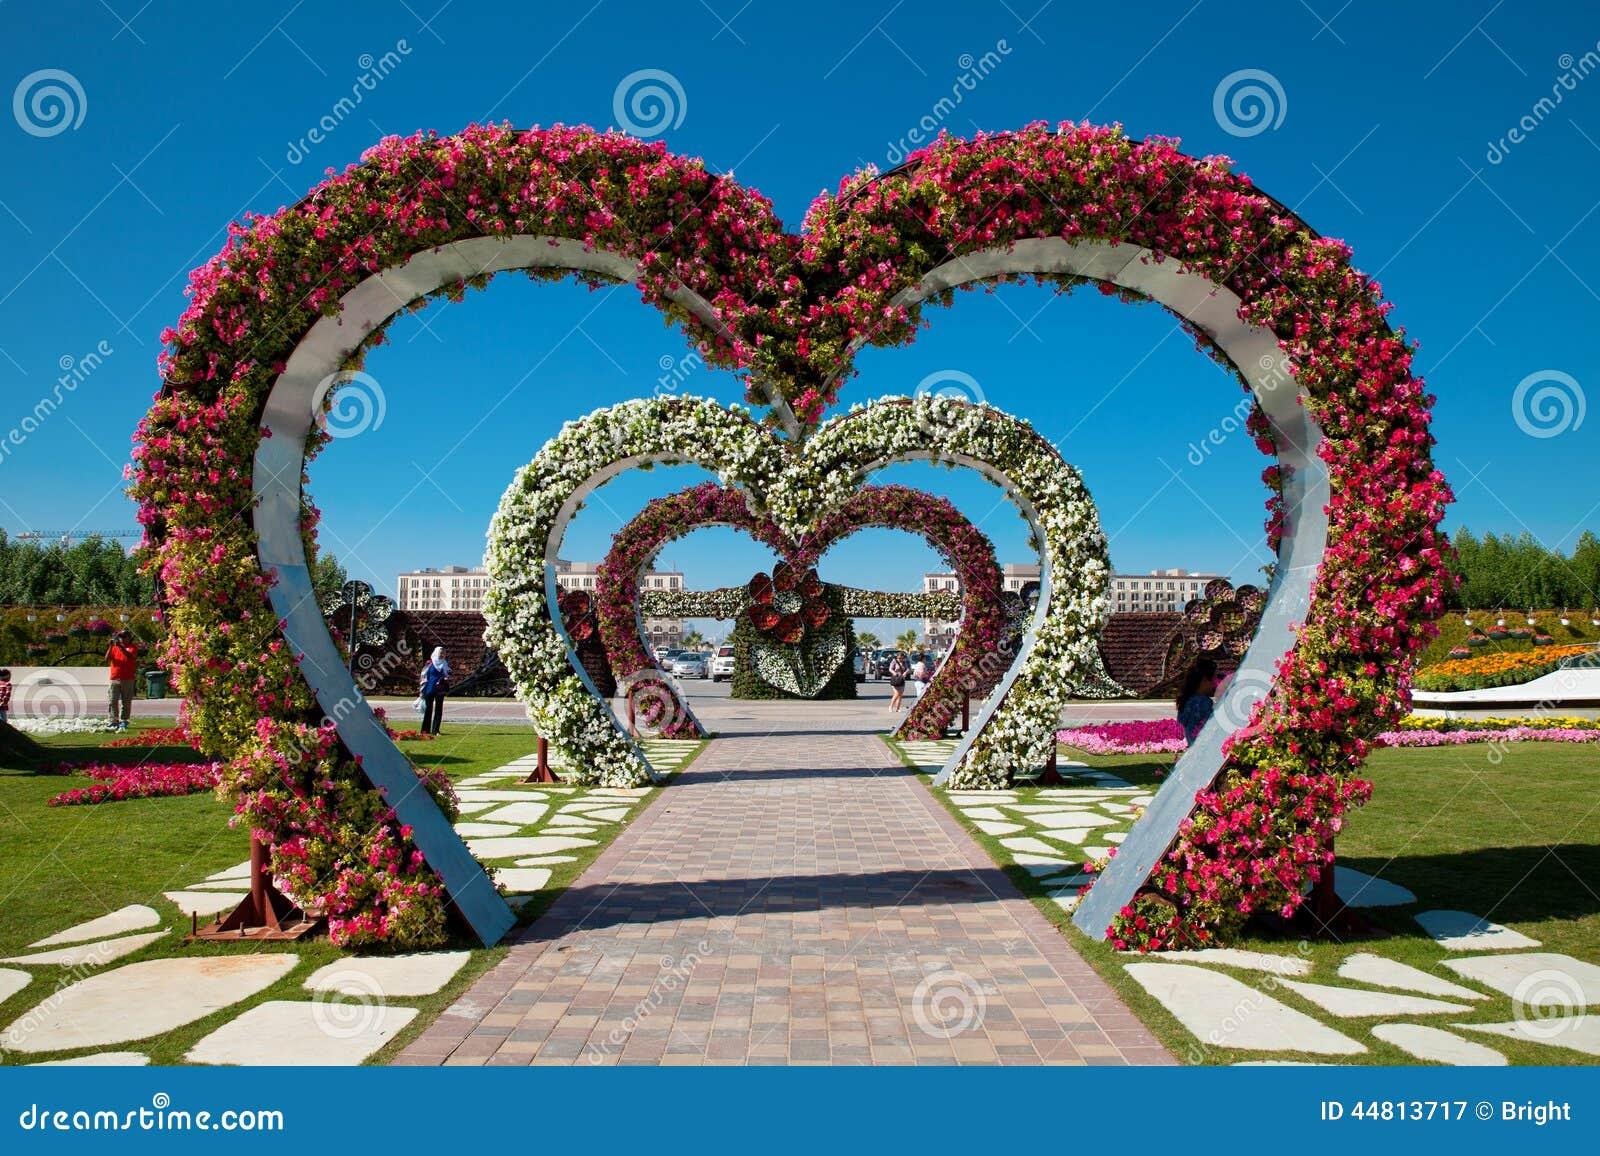 Jardines de flores dubai fotograf a editorial imagen - Fotos de flores de jardin ...